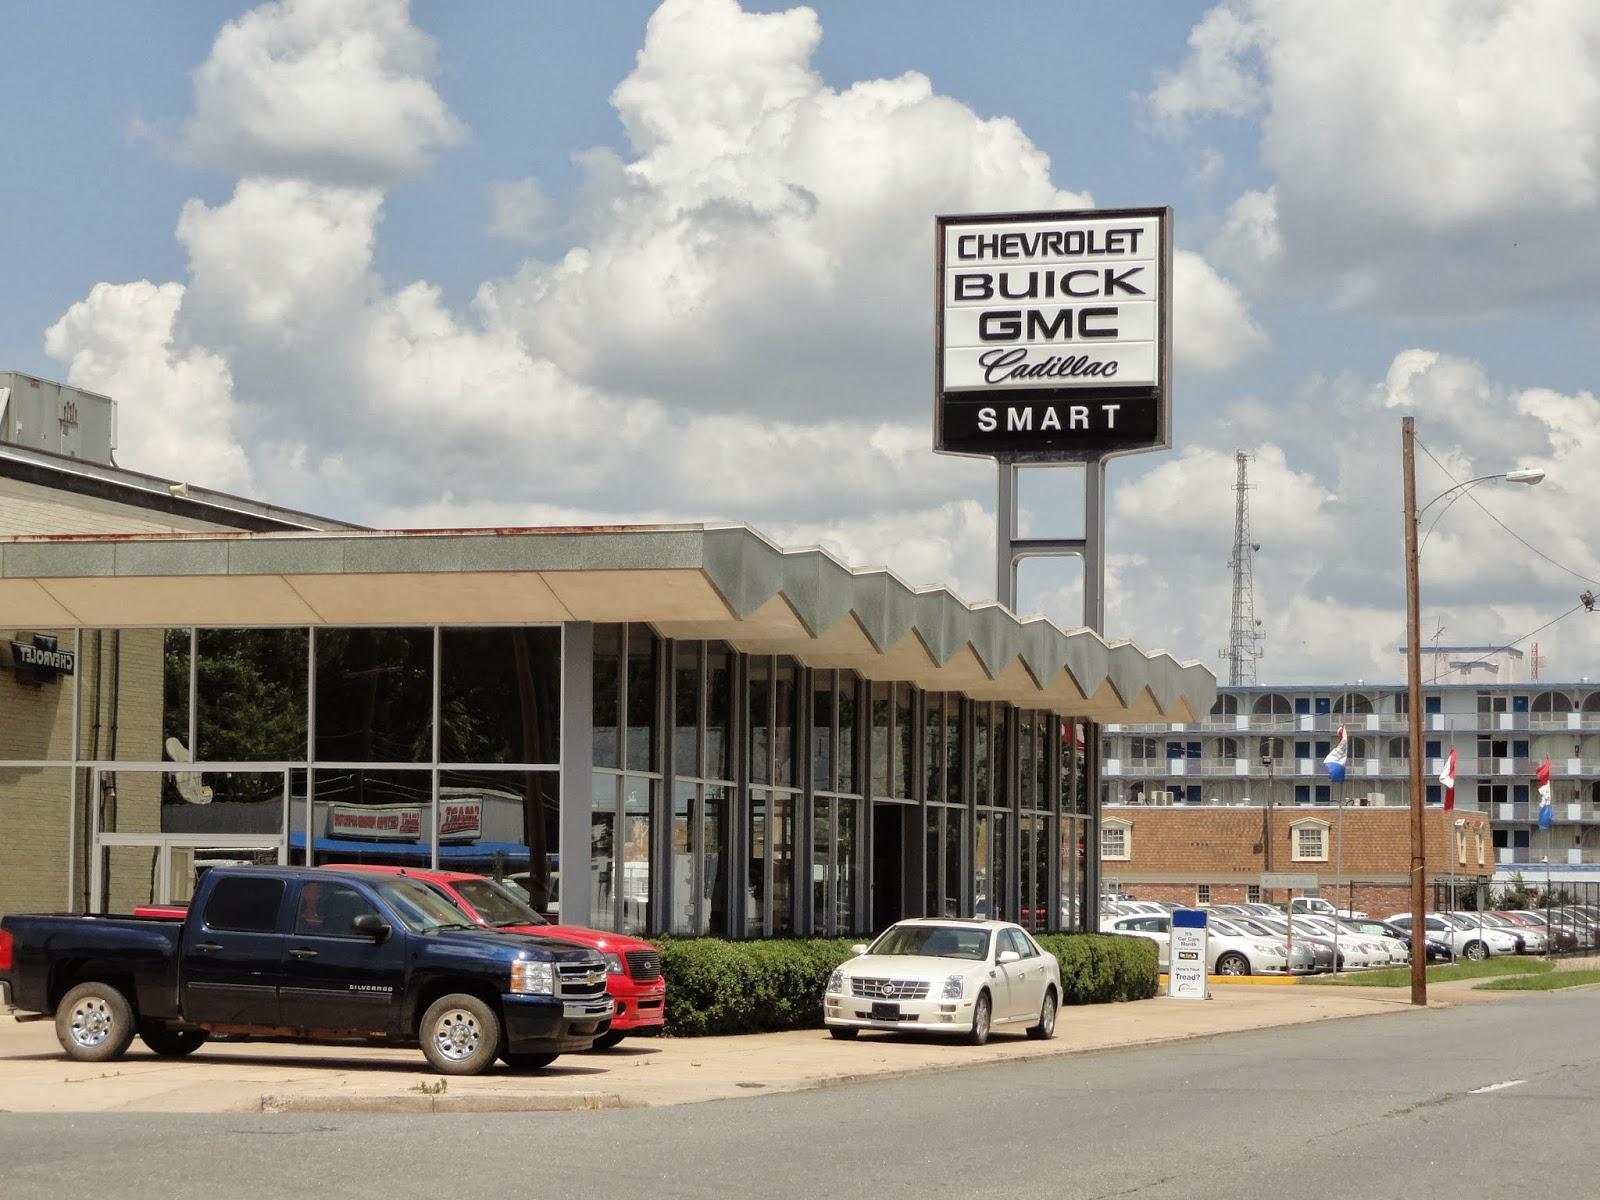 Smart Car Dealership In Pine Bluff Arkansas